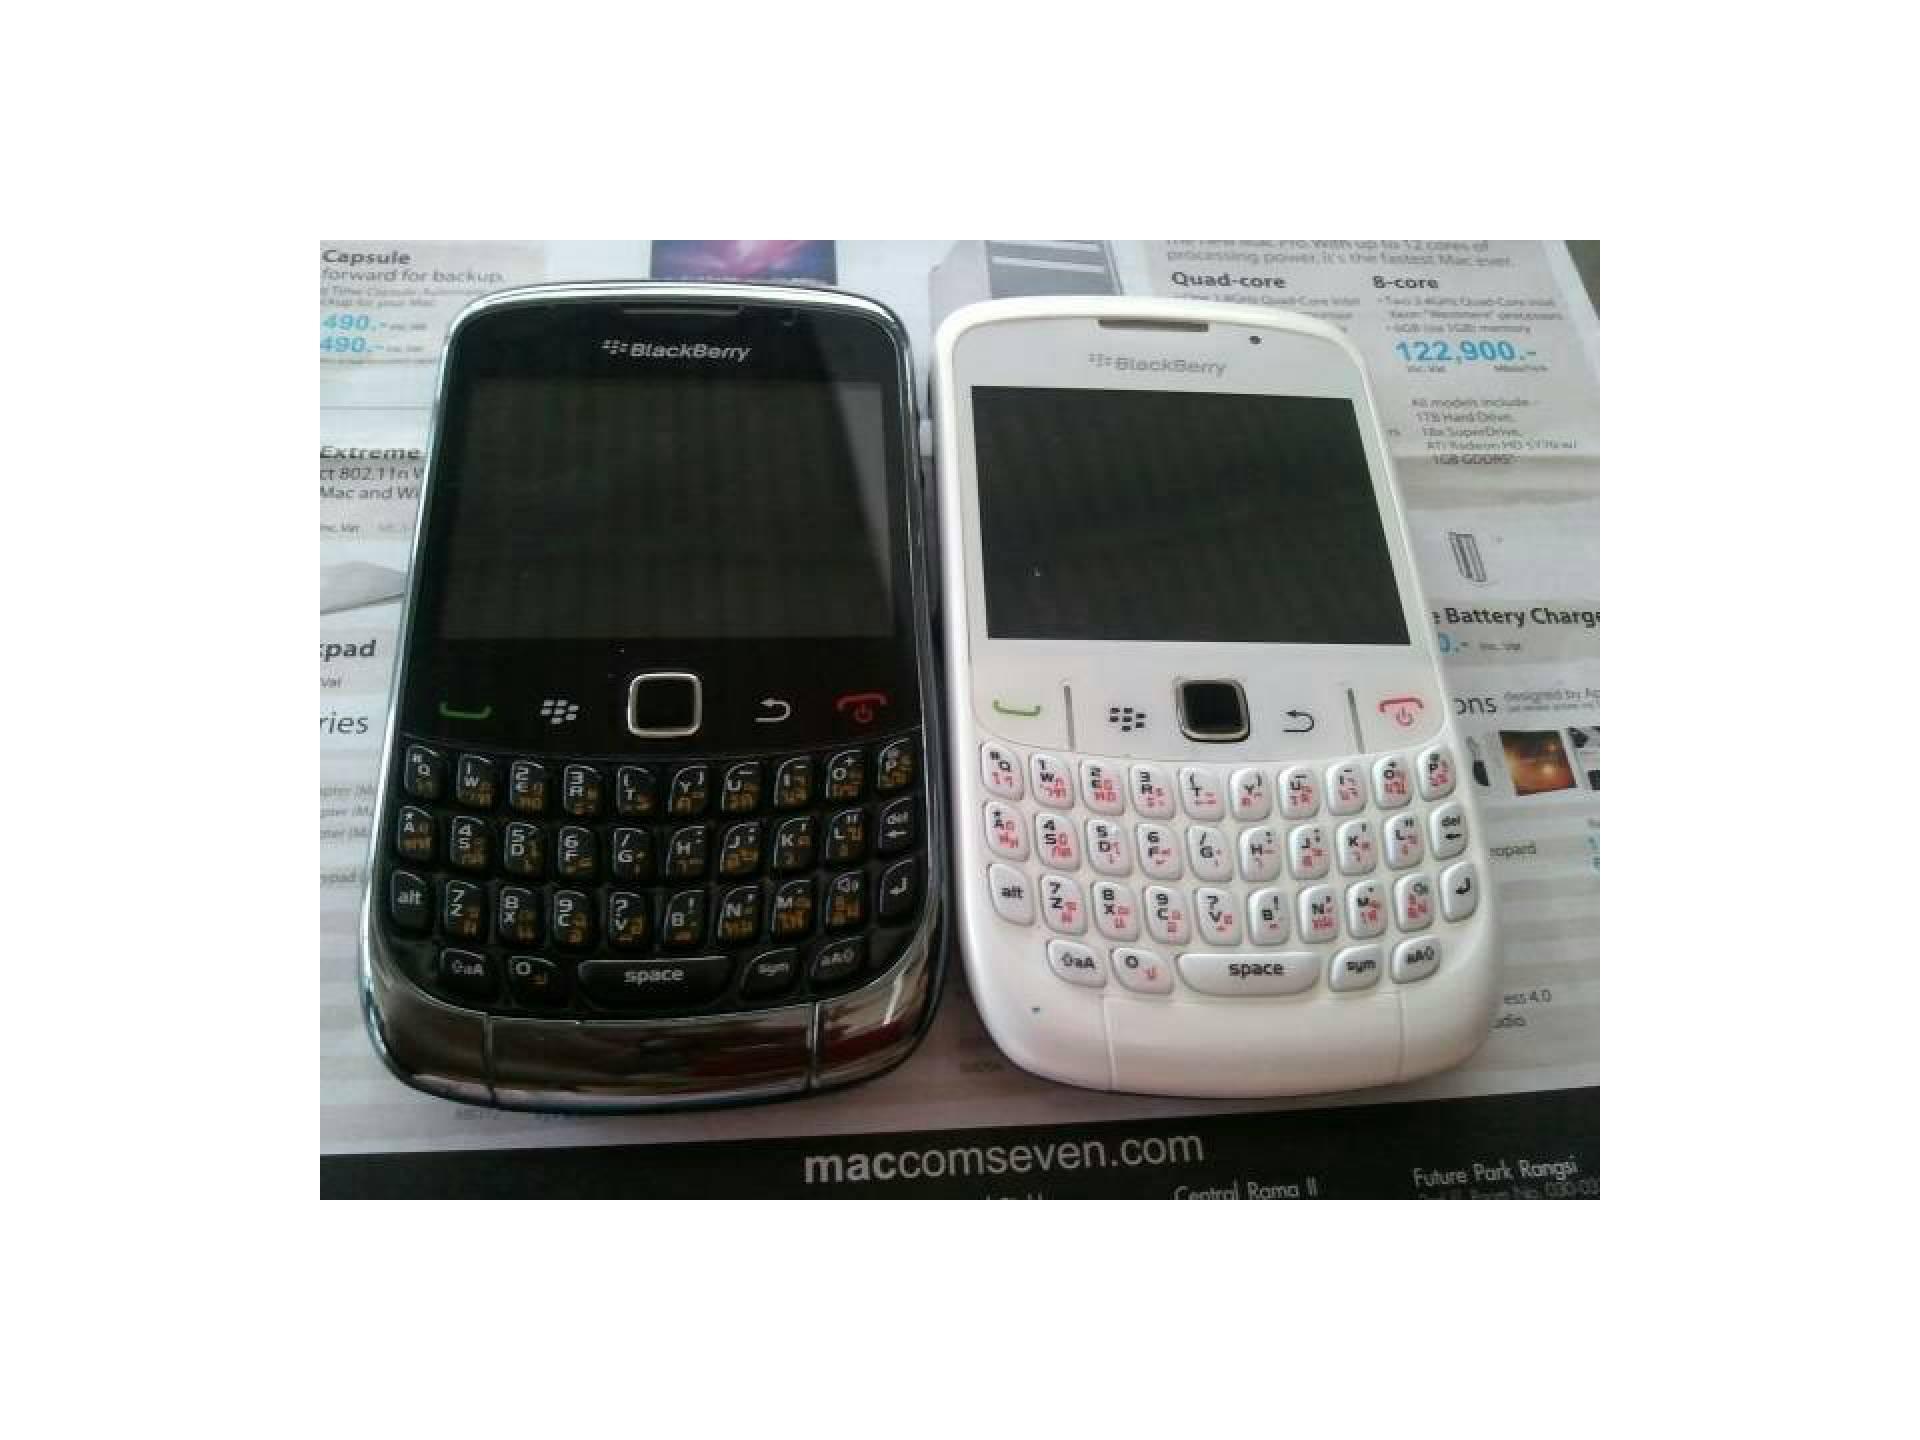 Blackberry curve 9300 gemini 3G